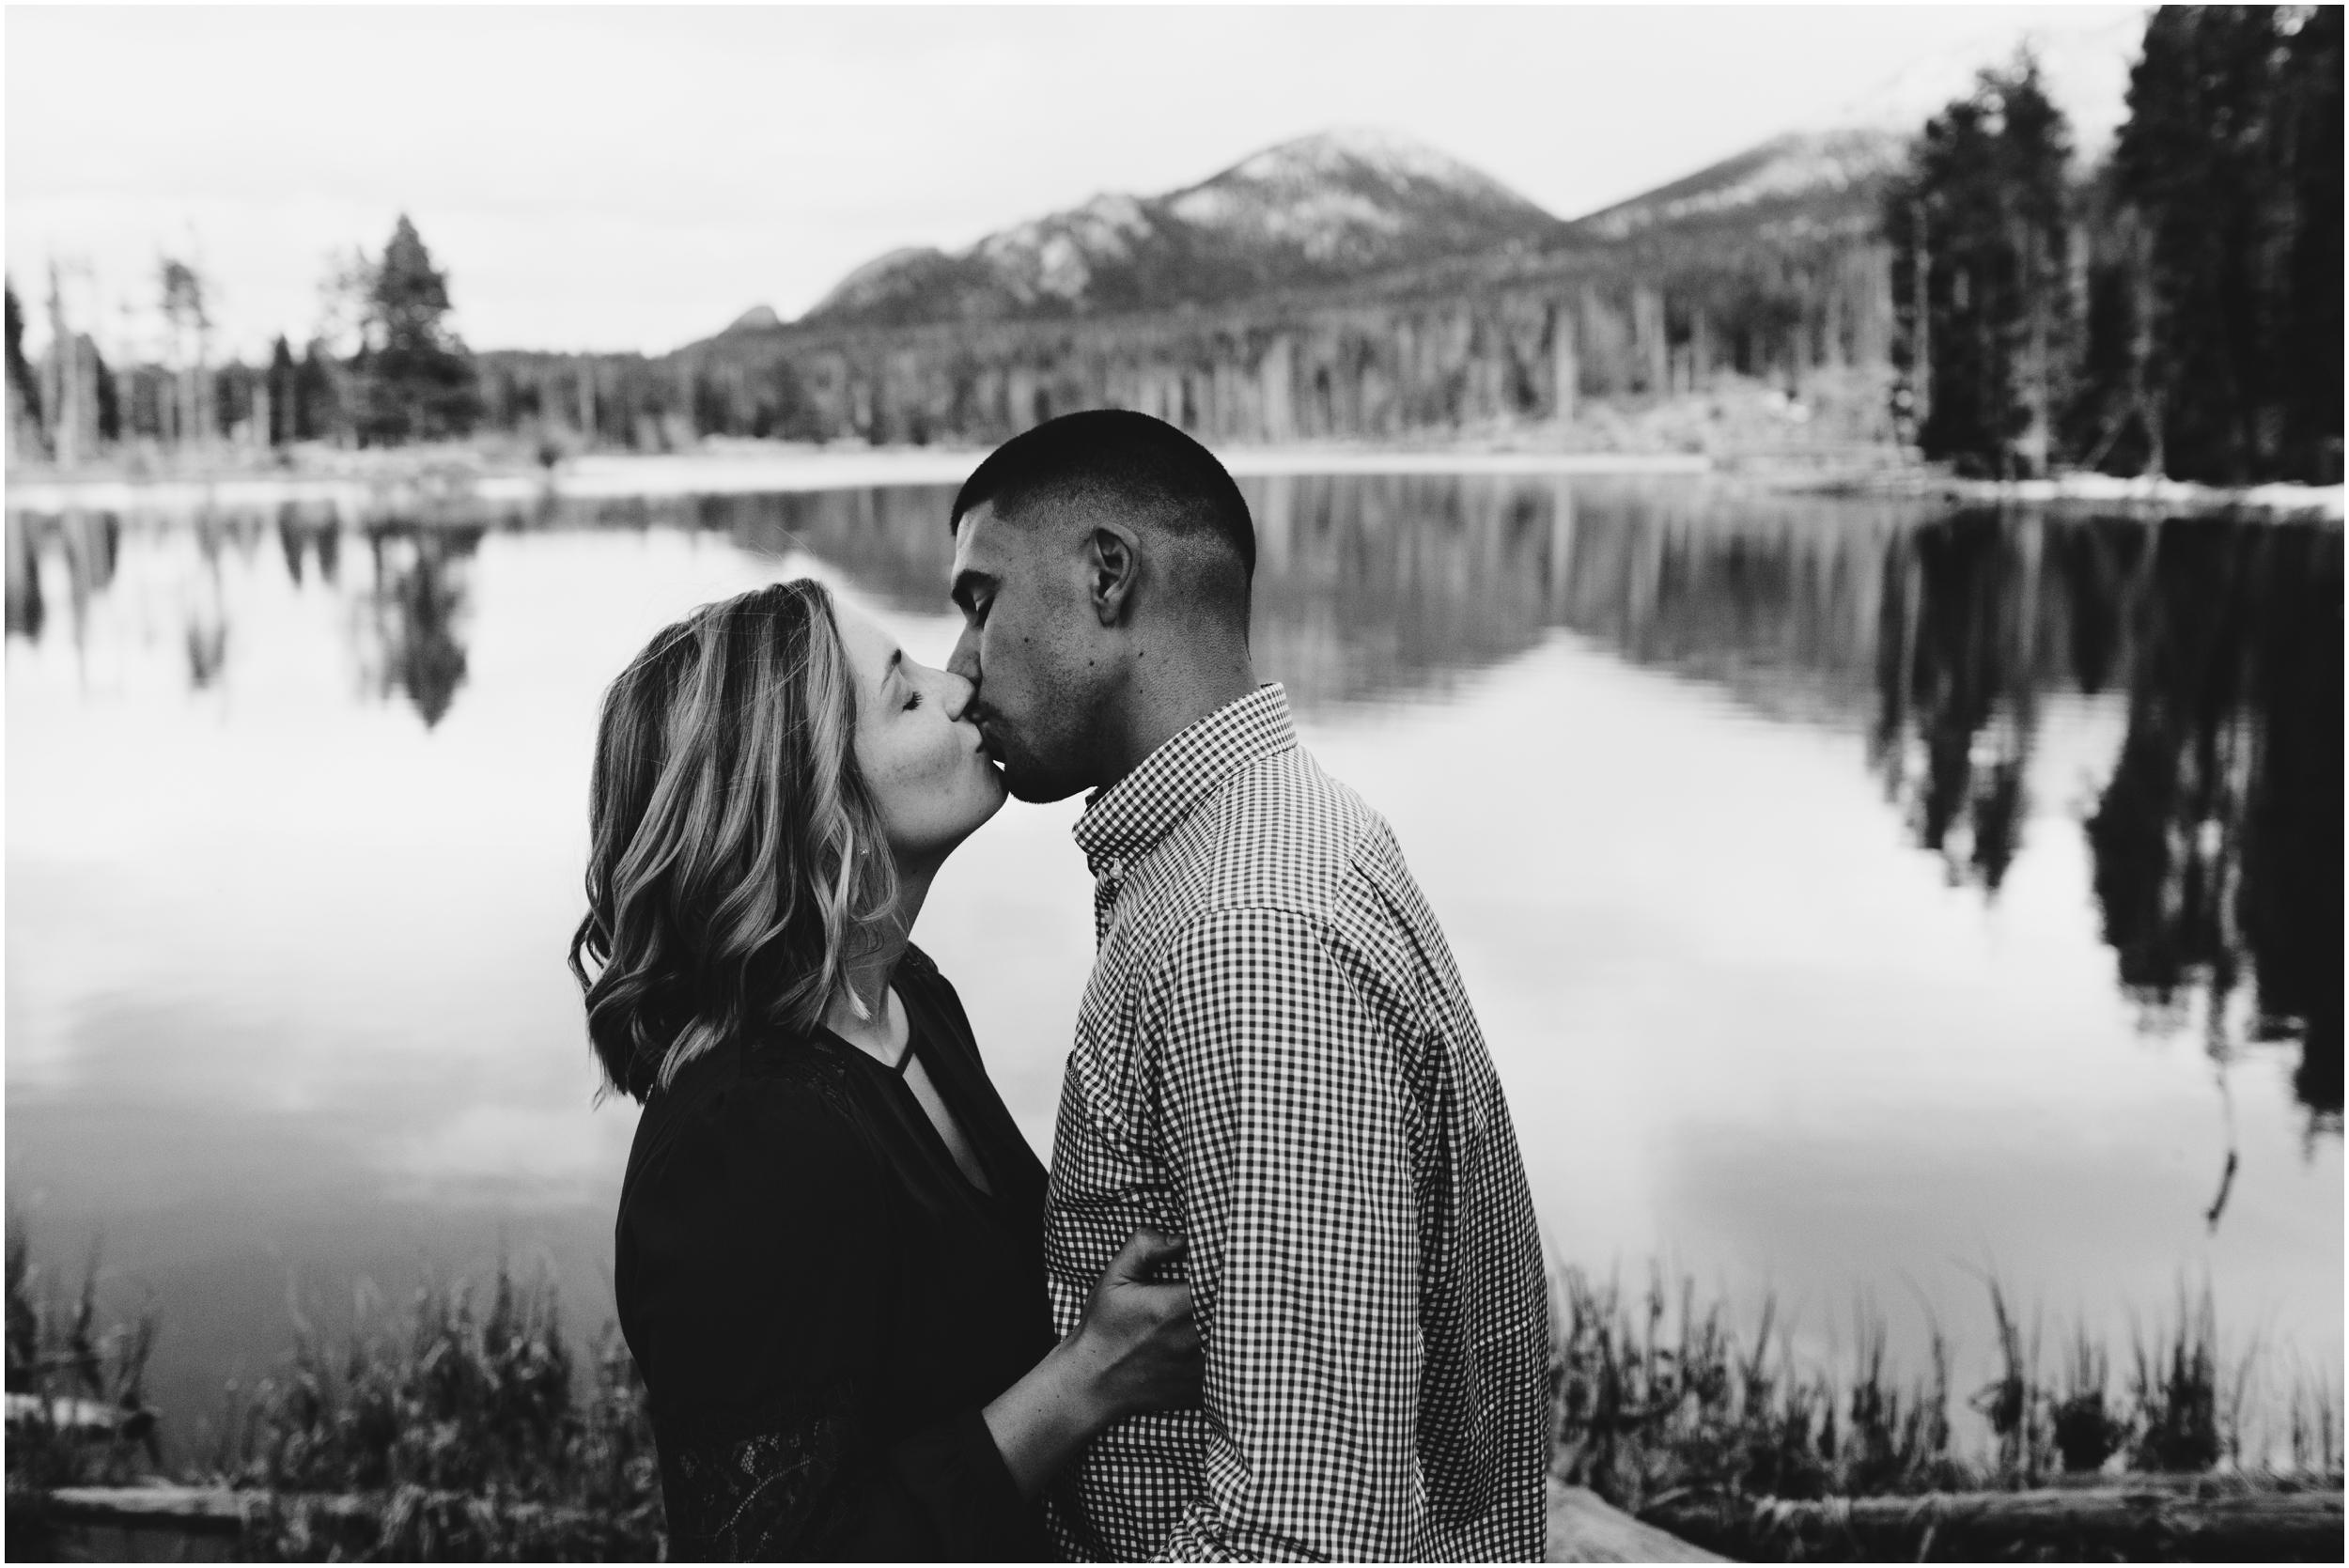 rocky-mountain-national-park-elopement-sprague-lake-colorado-adventure-wedding-photographer_taylor-powers_158.jpg